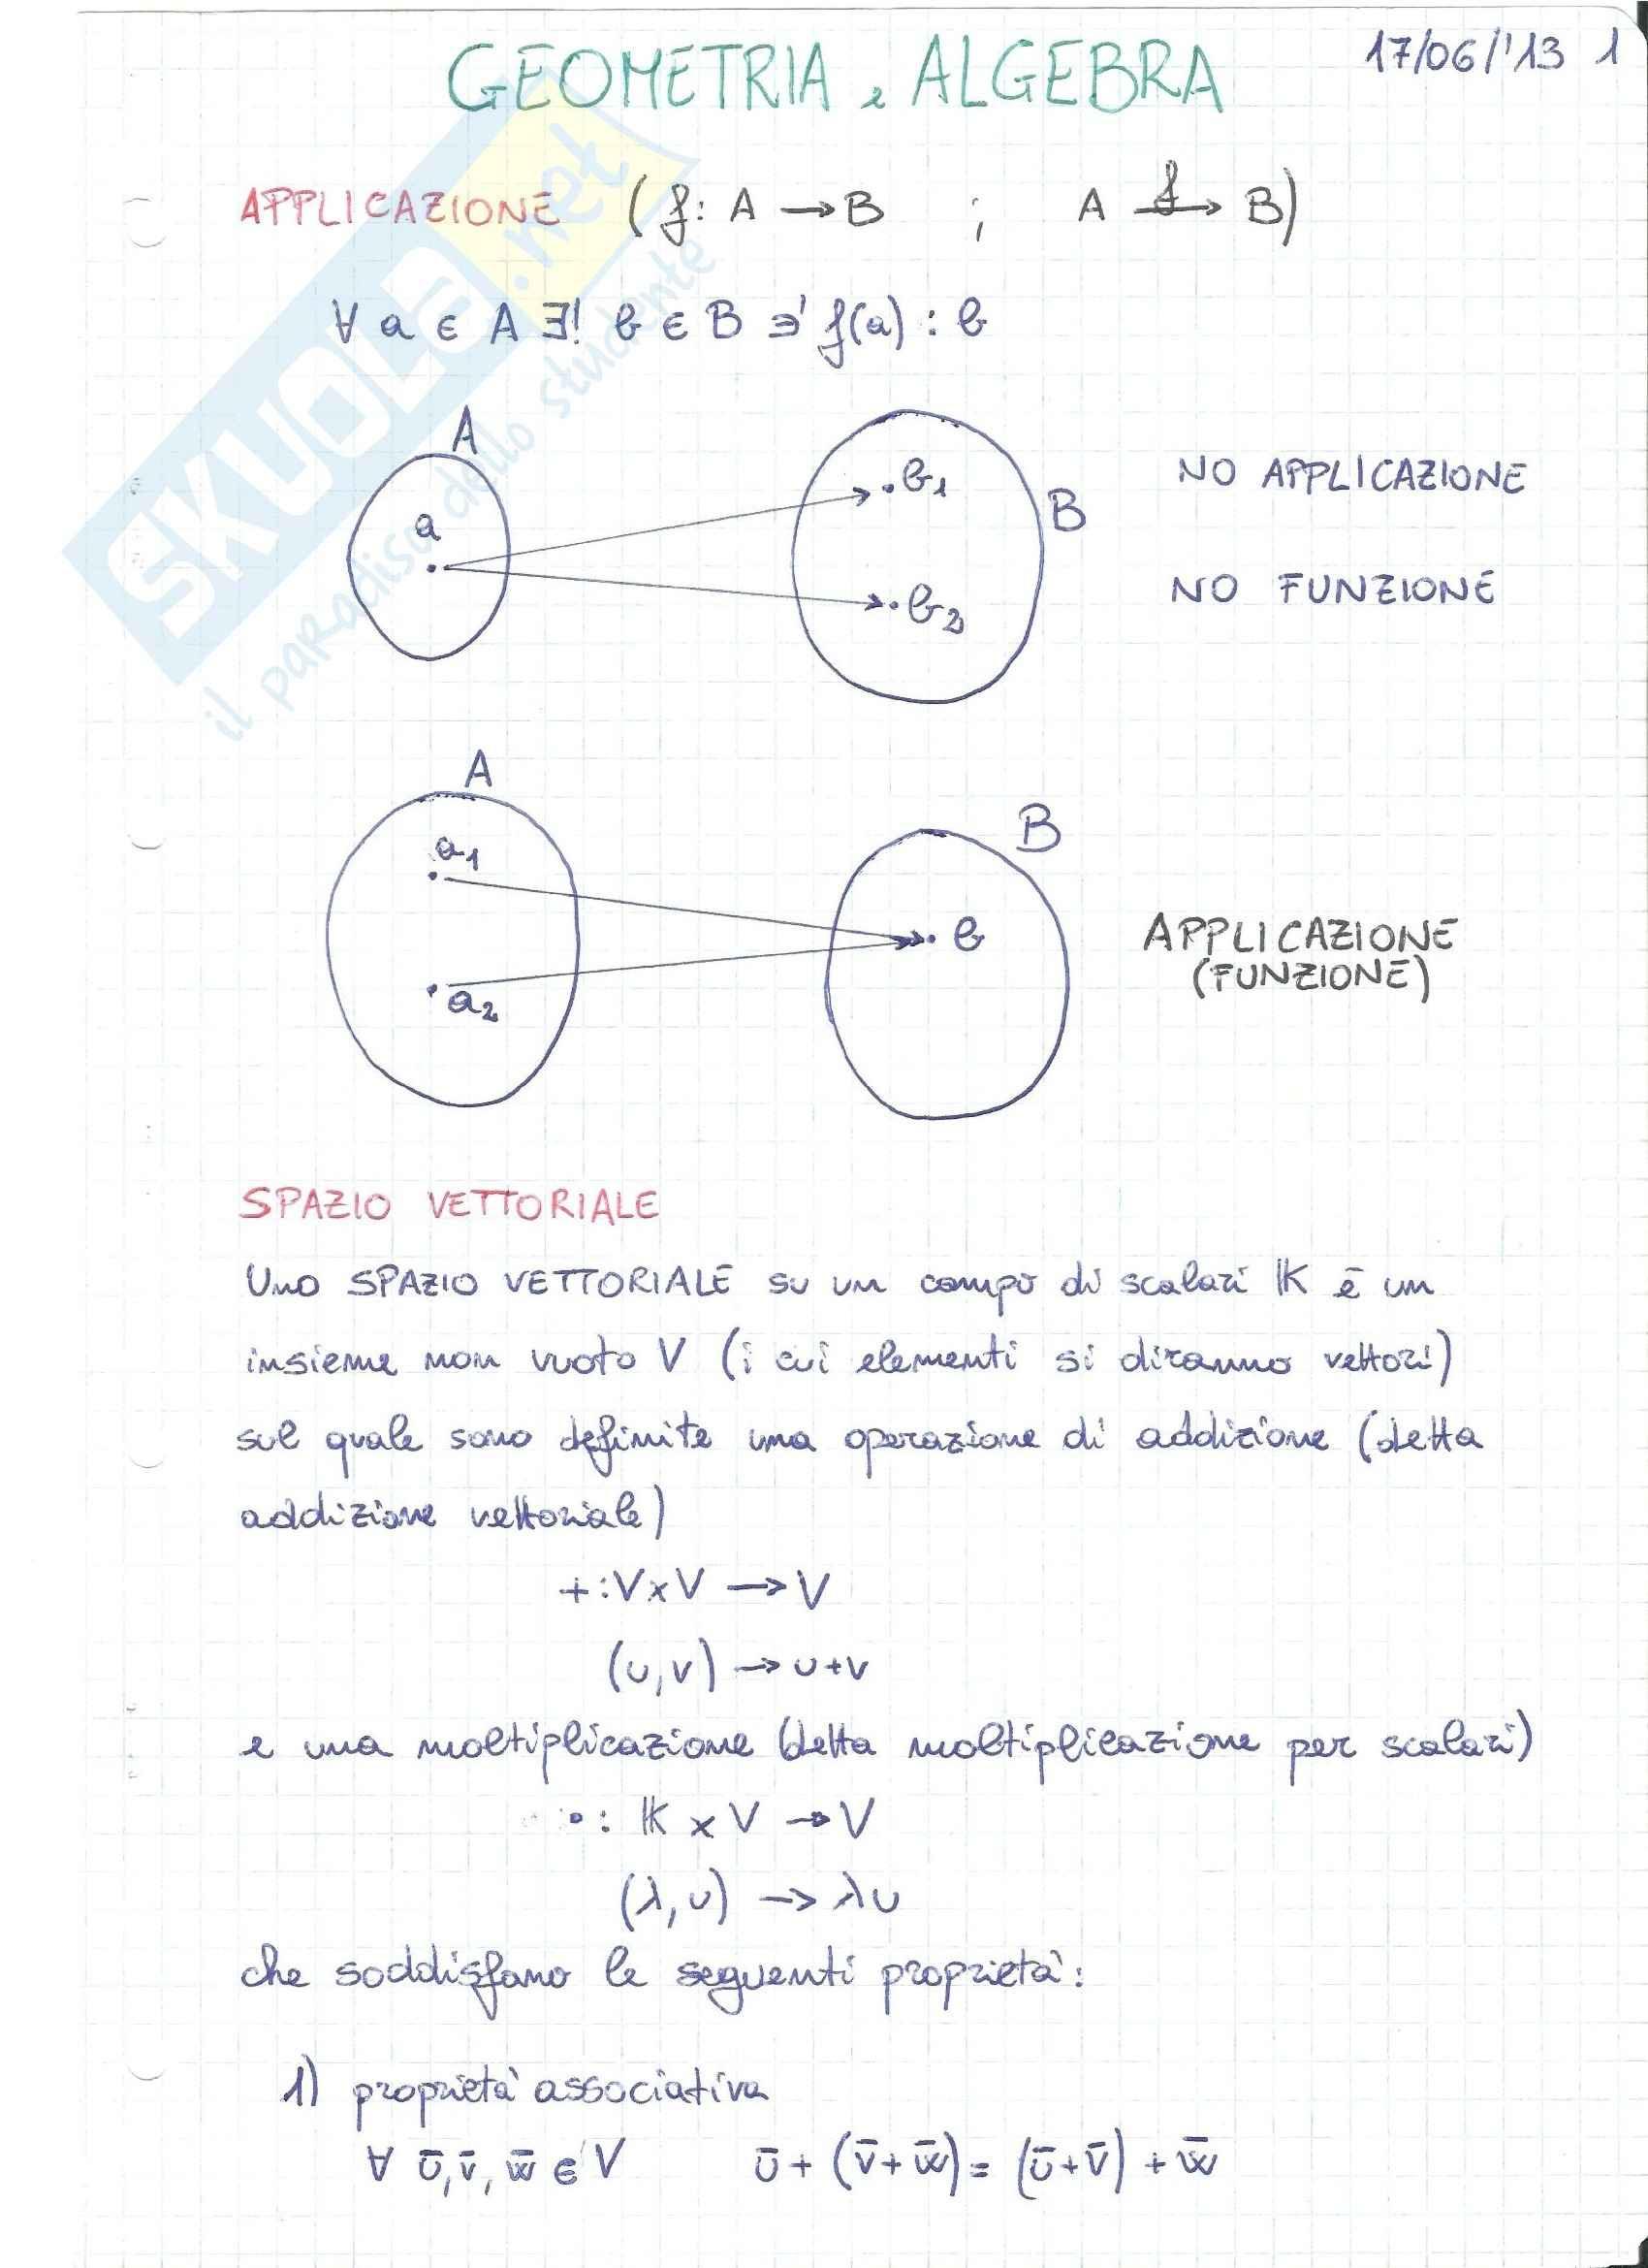 Geometria e Algebra lineare - Appunti con sintesi